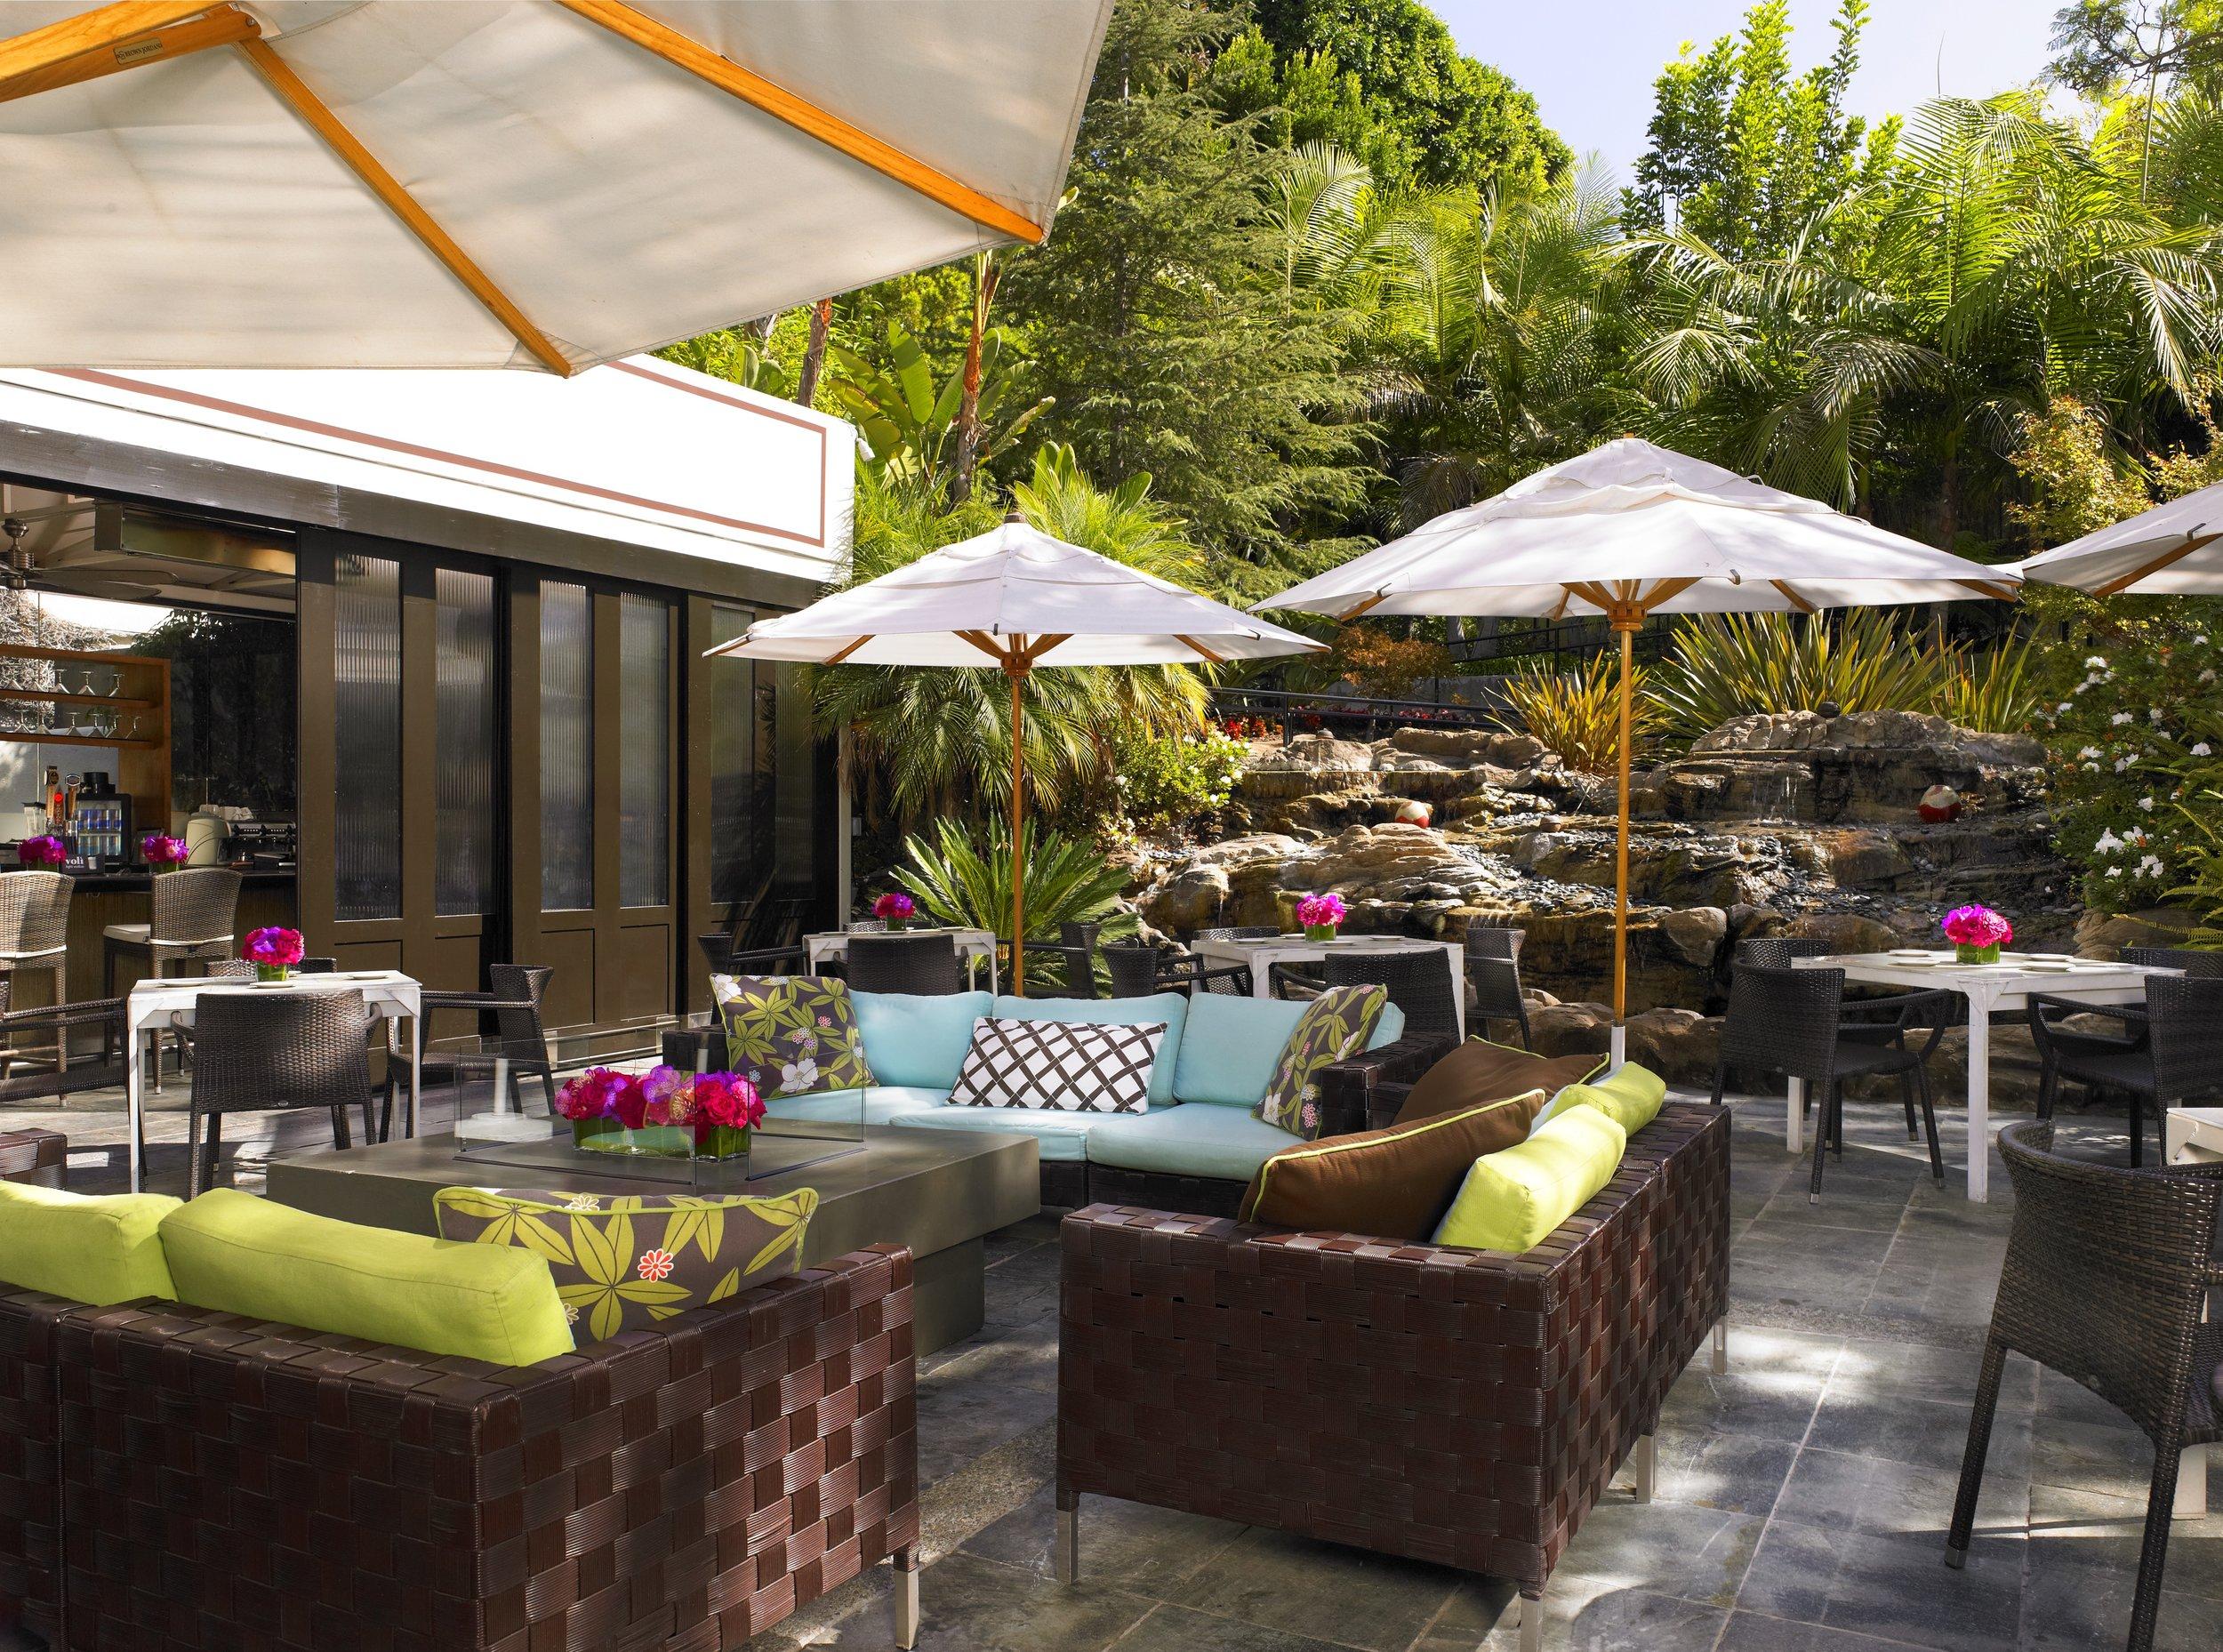 The Backyard Restaurant